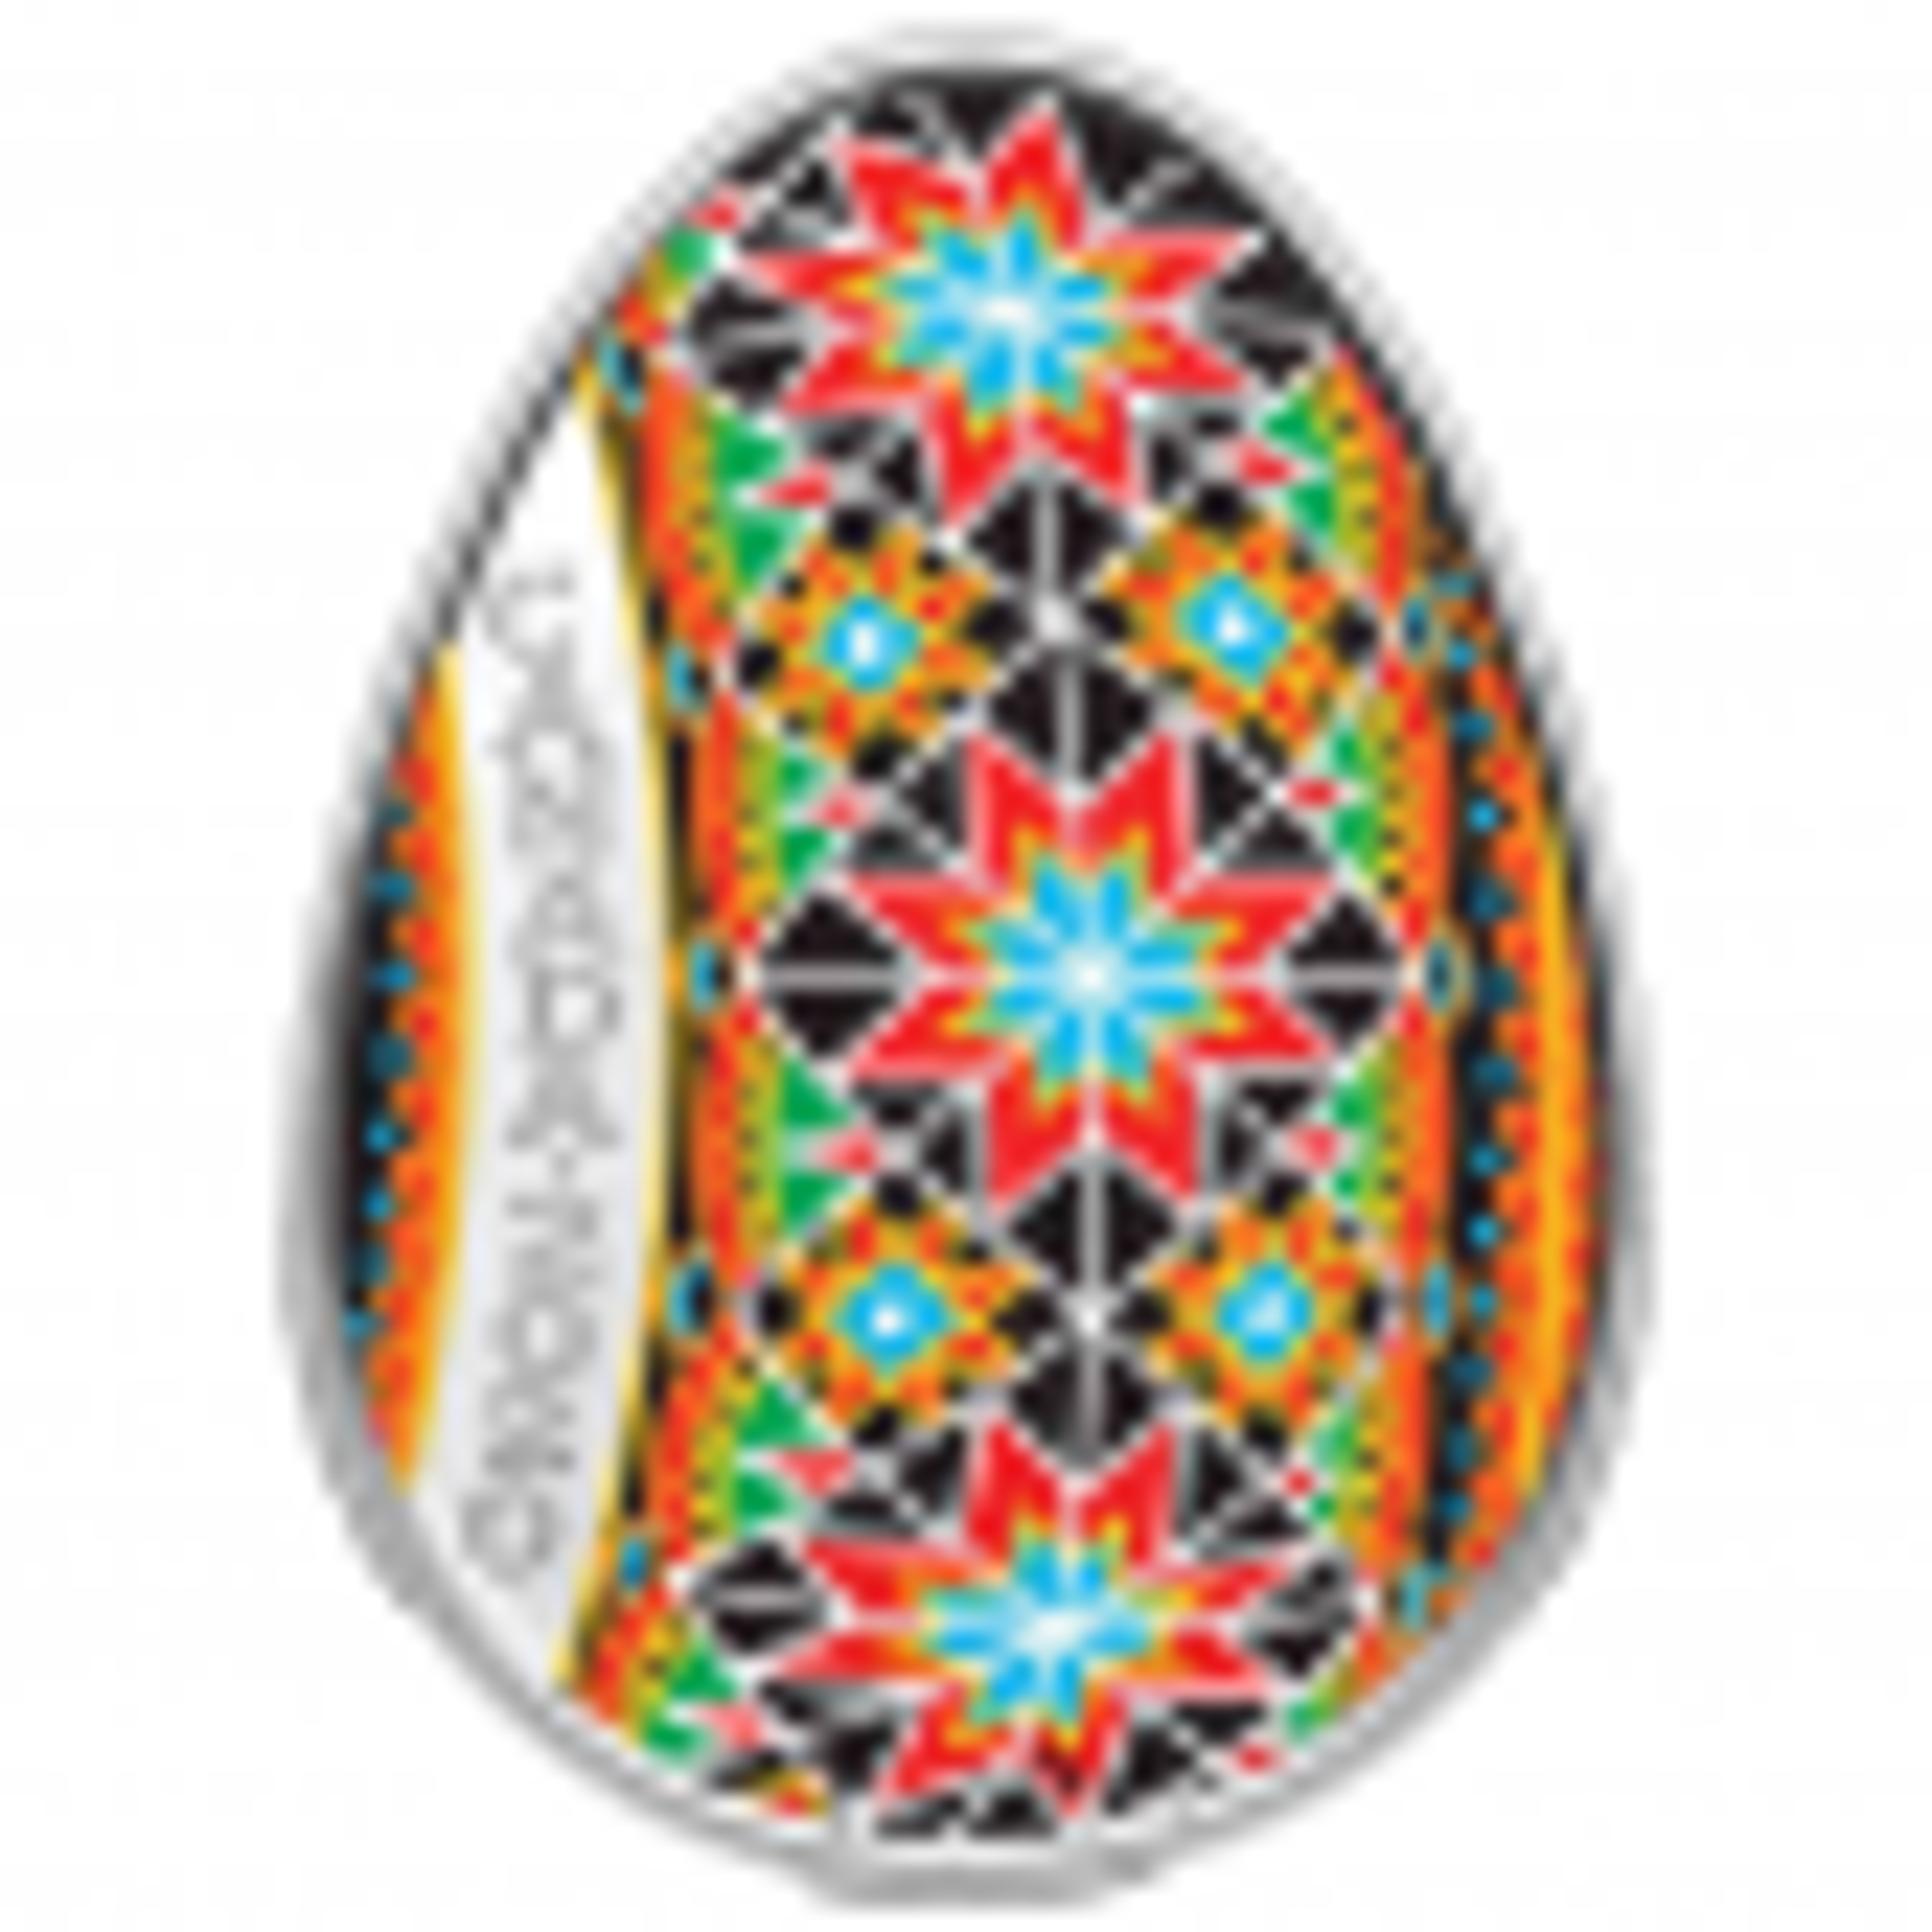 1 Troy ounce silver coin Pysanka Egg 2020 Proof